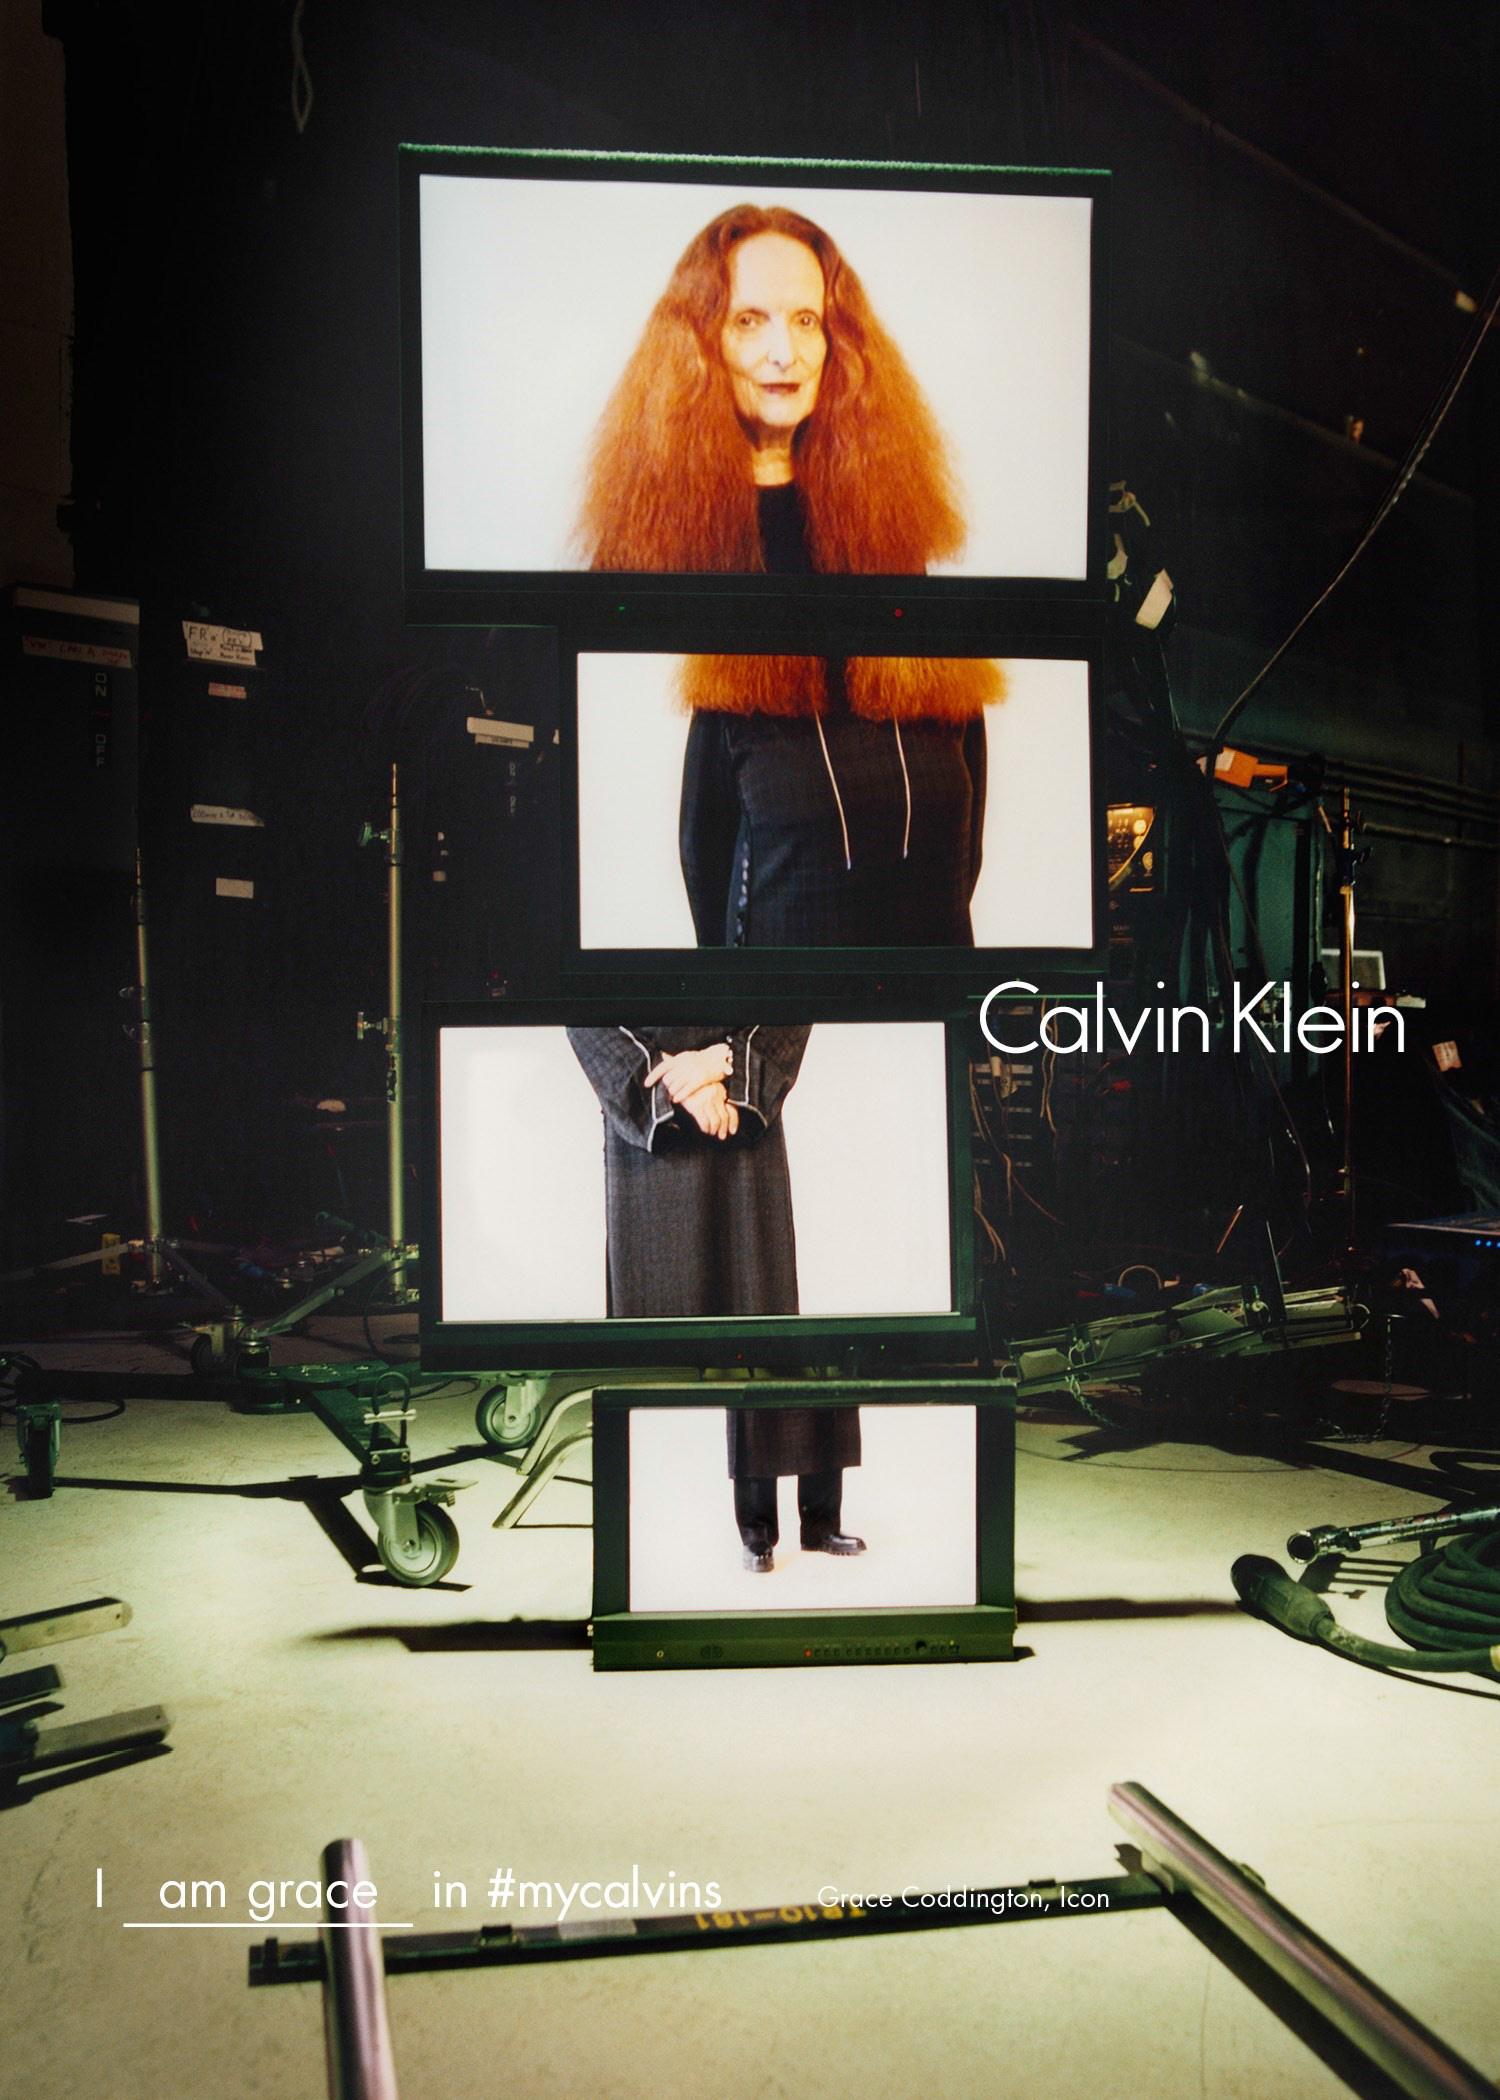 so-it-goes-calvin-klein-aw16-campaign-11.jpg